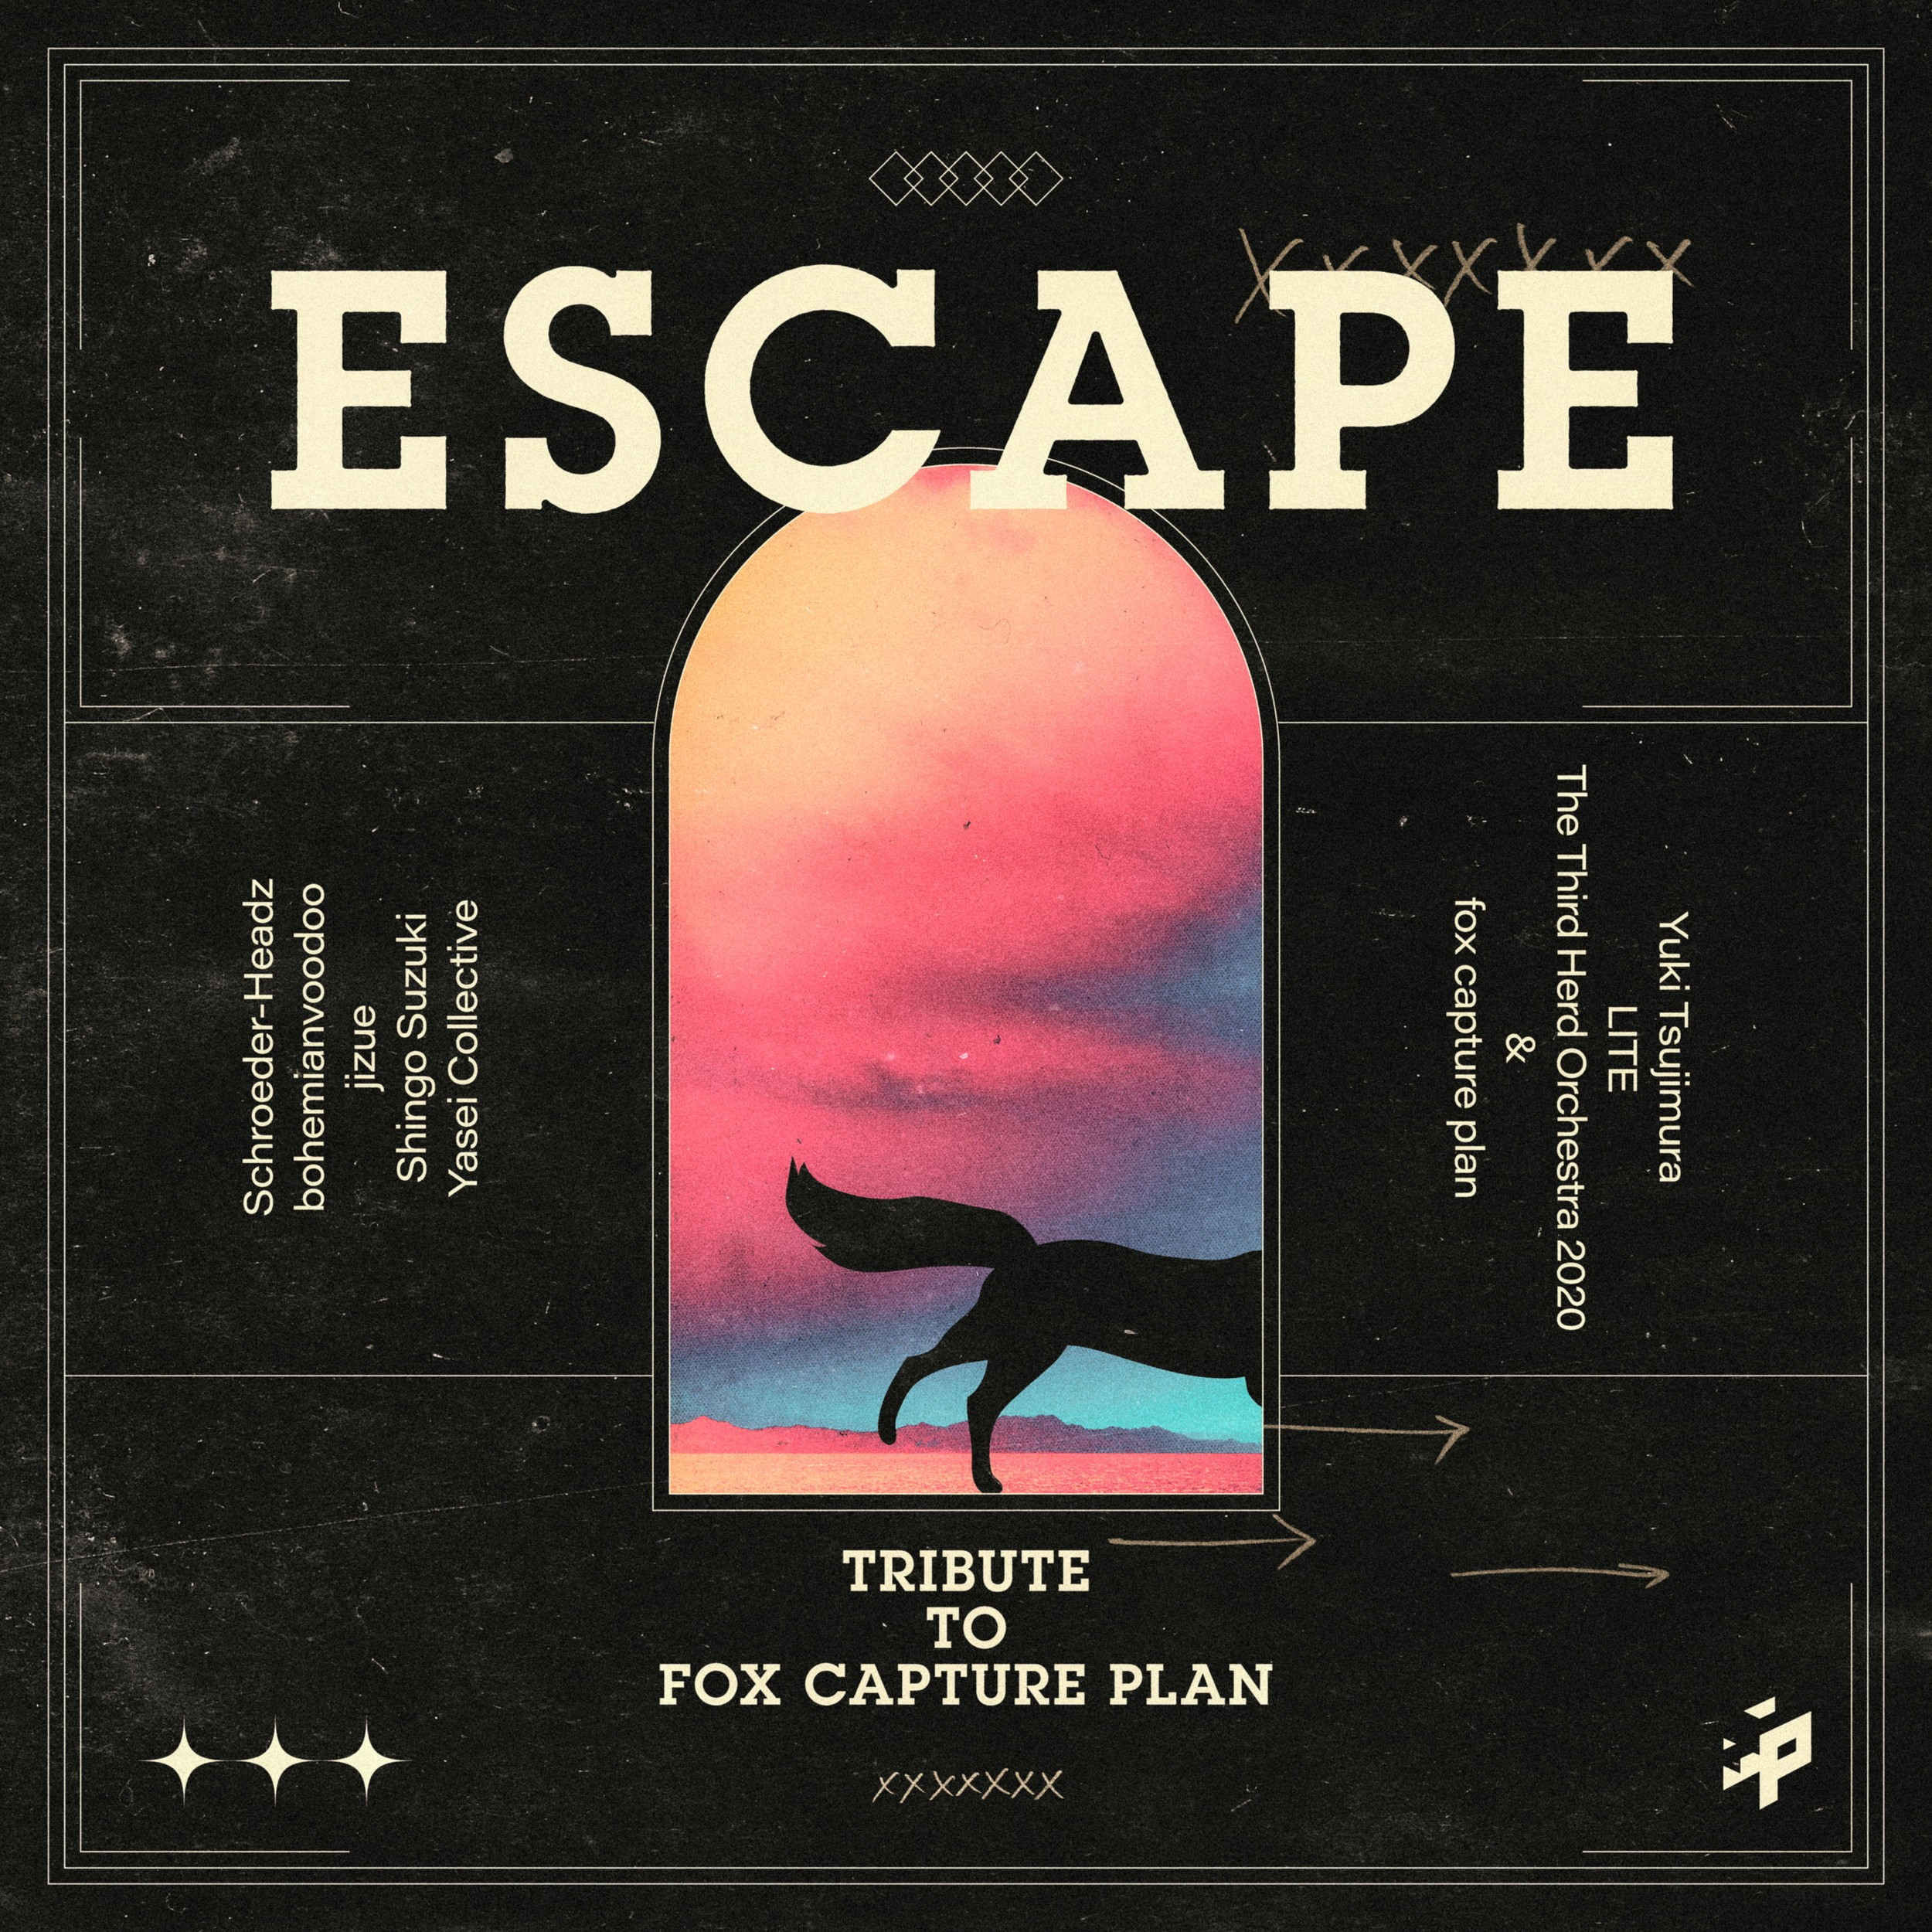 VA – ESCAPE -Tribute to fox capture plan- [FLAC / WEB] [2021.07.21]